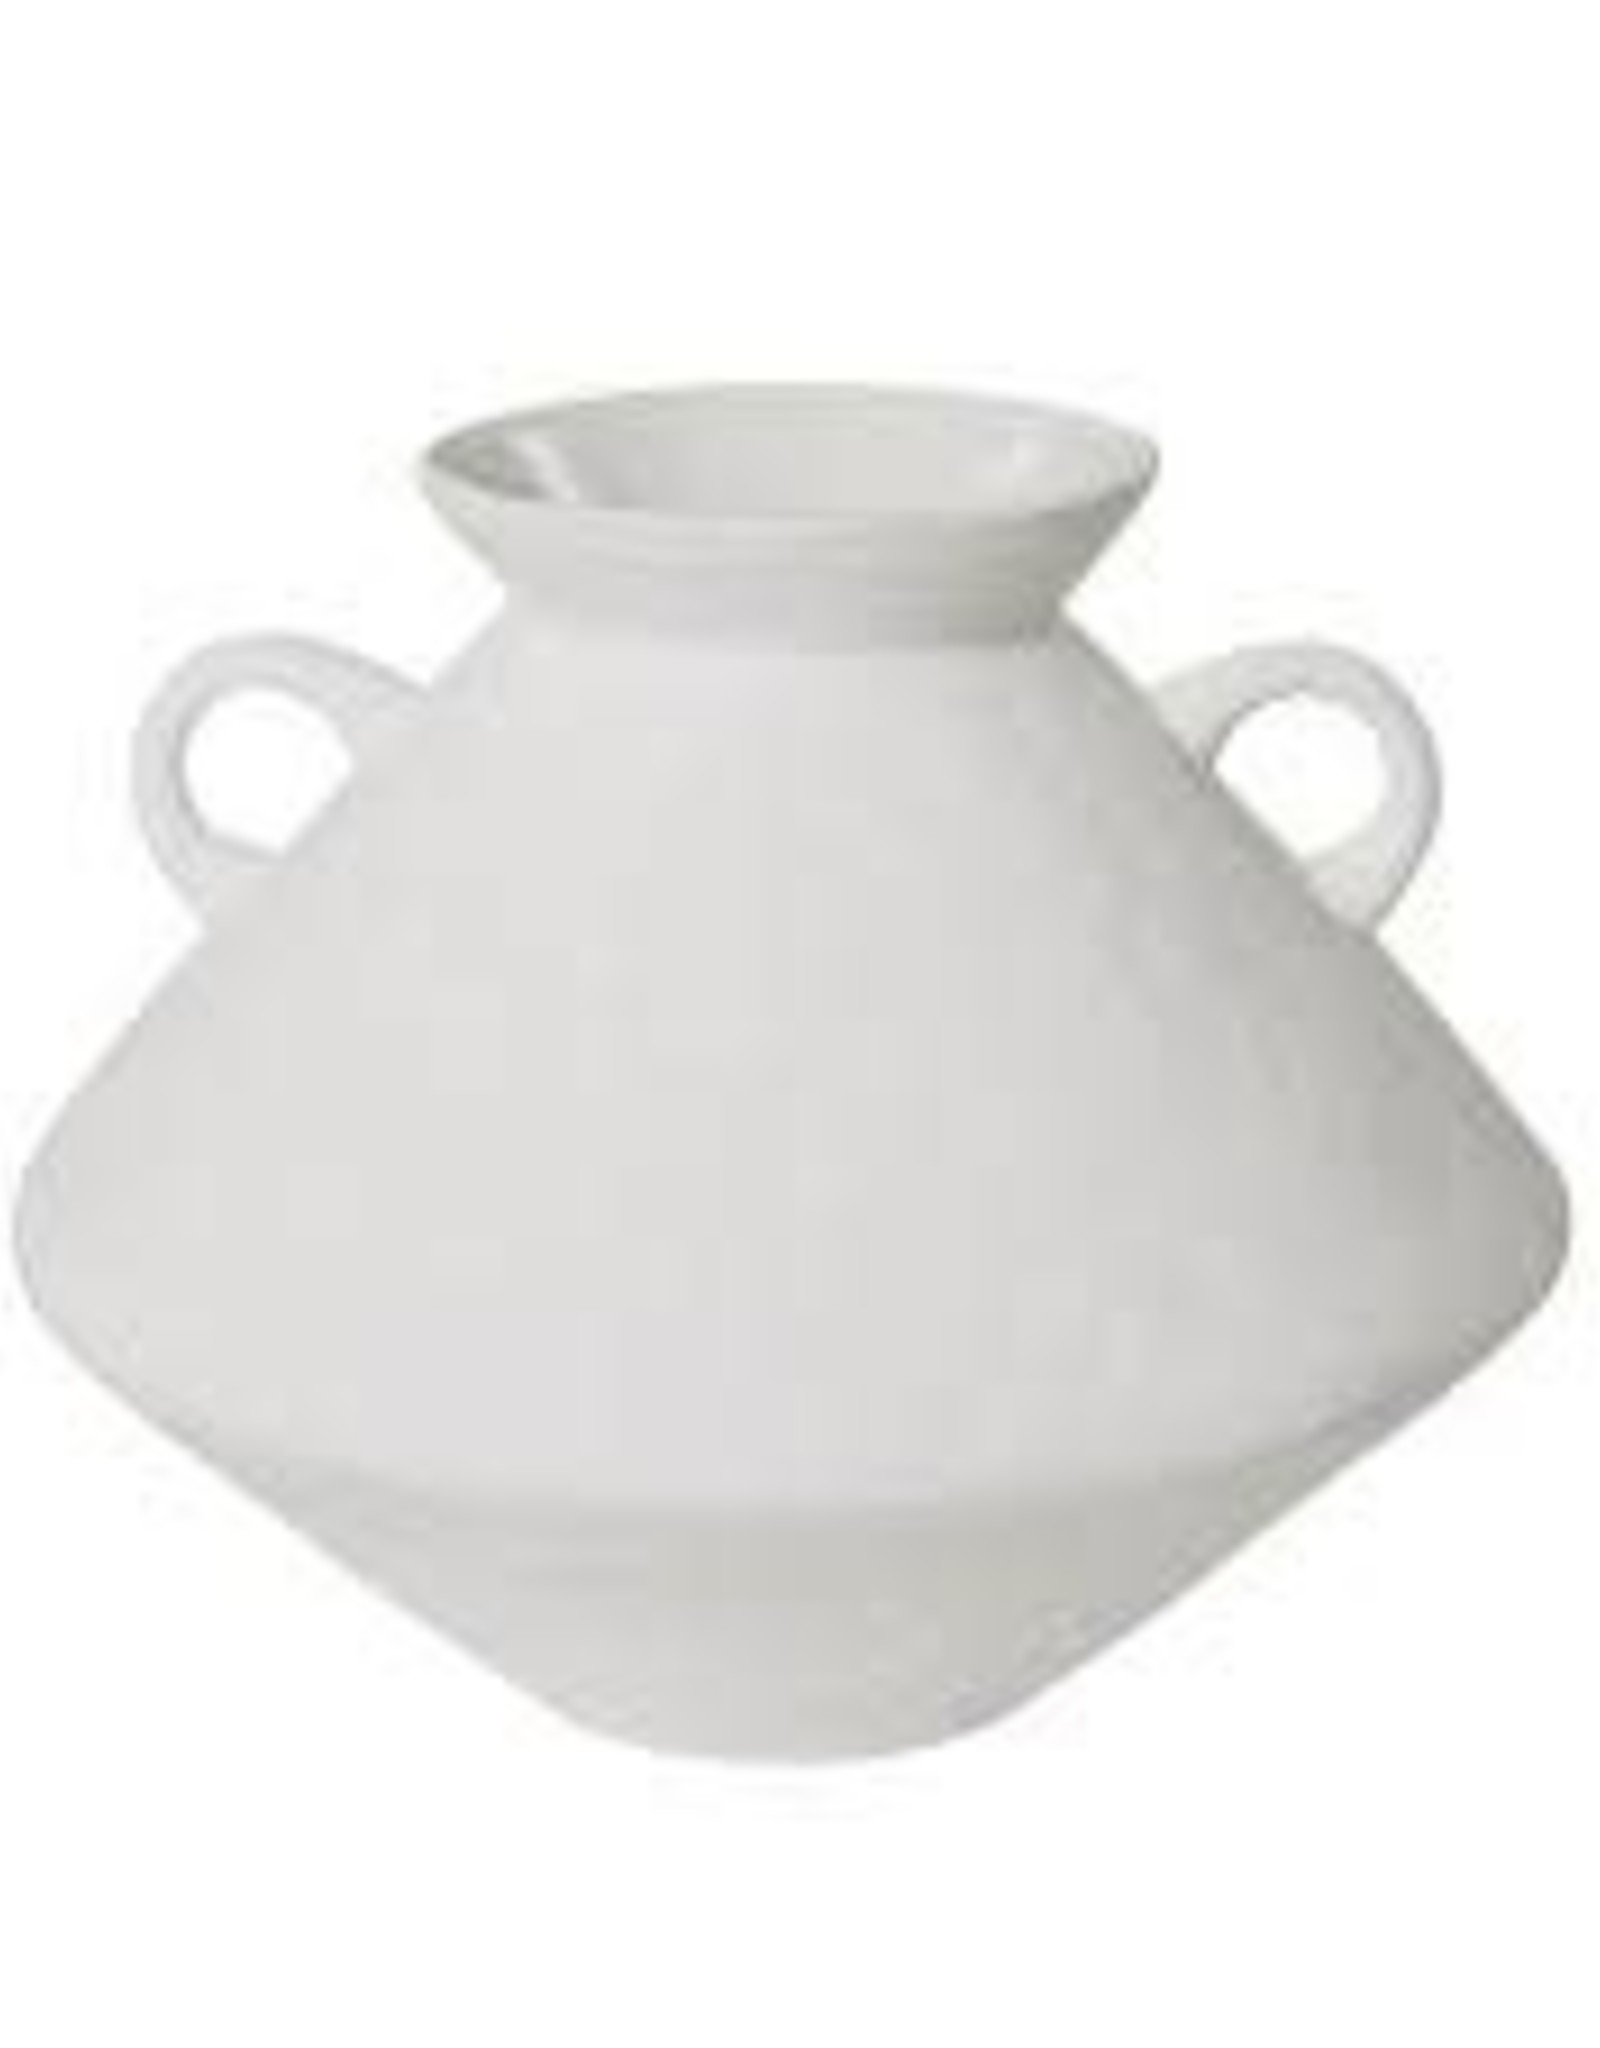 Cato white textured vase